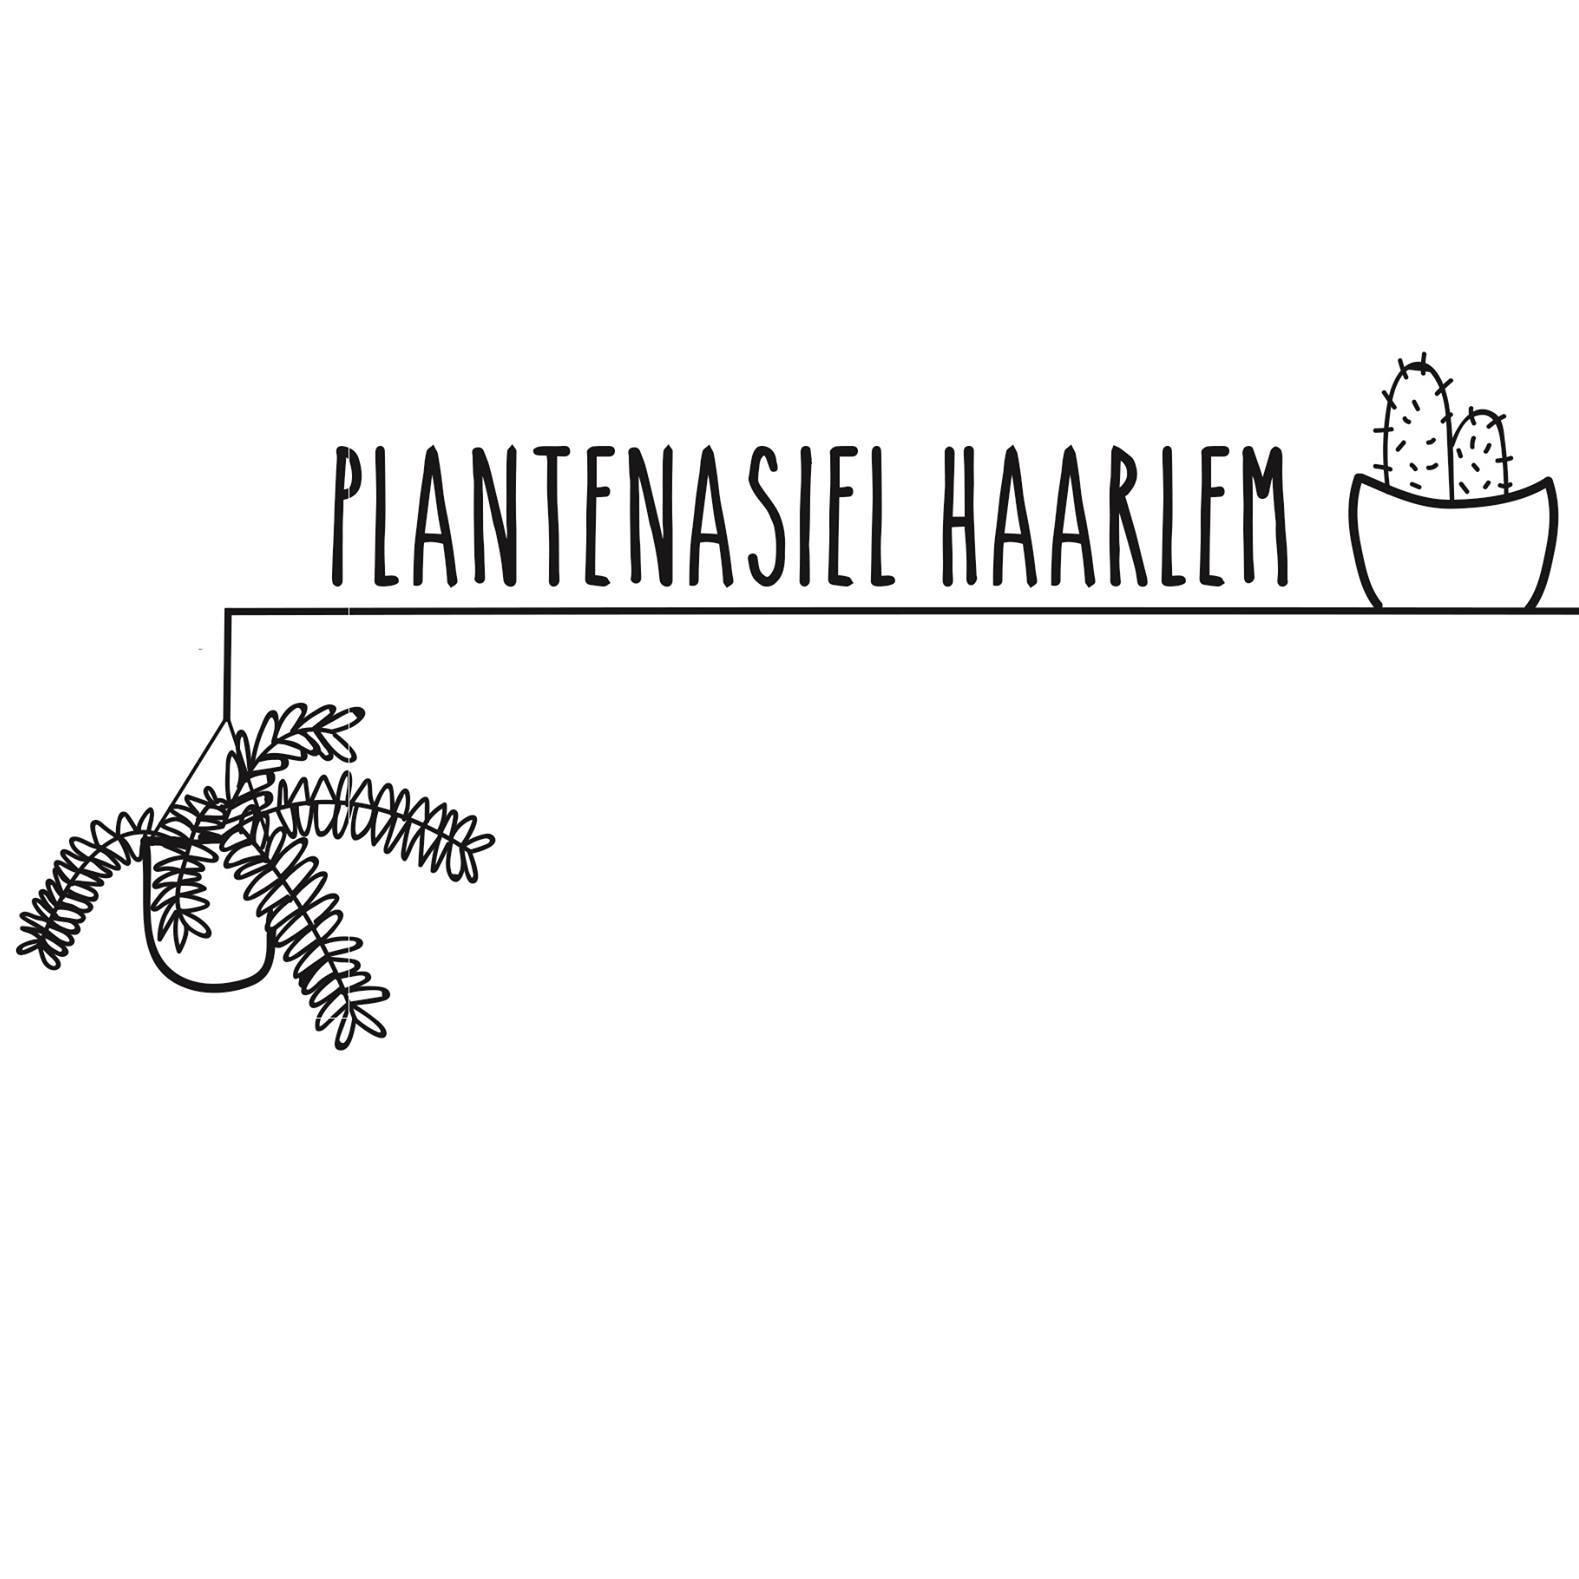 Plantenasiel Haarlem